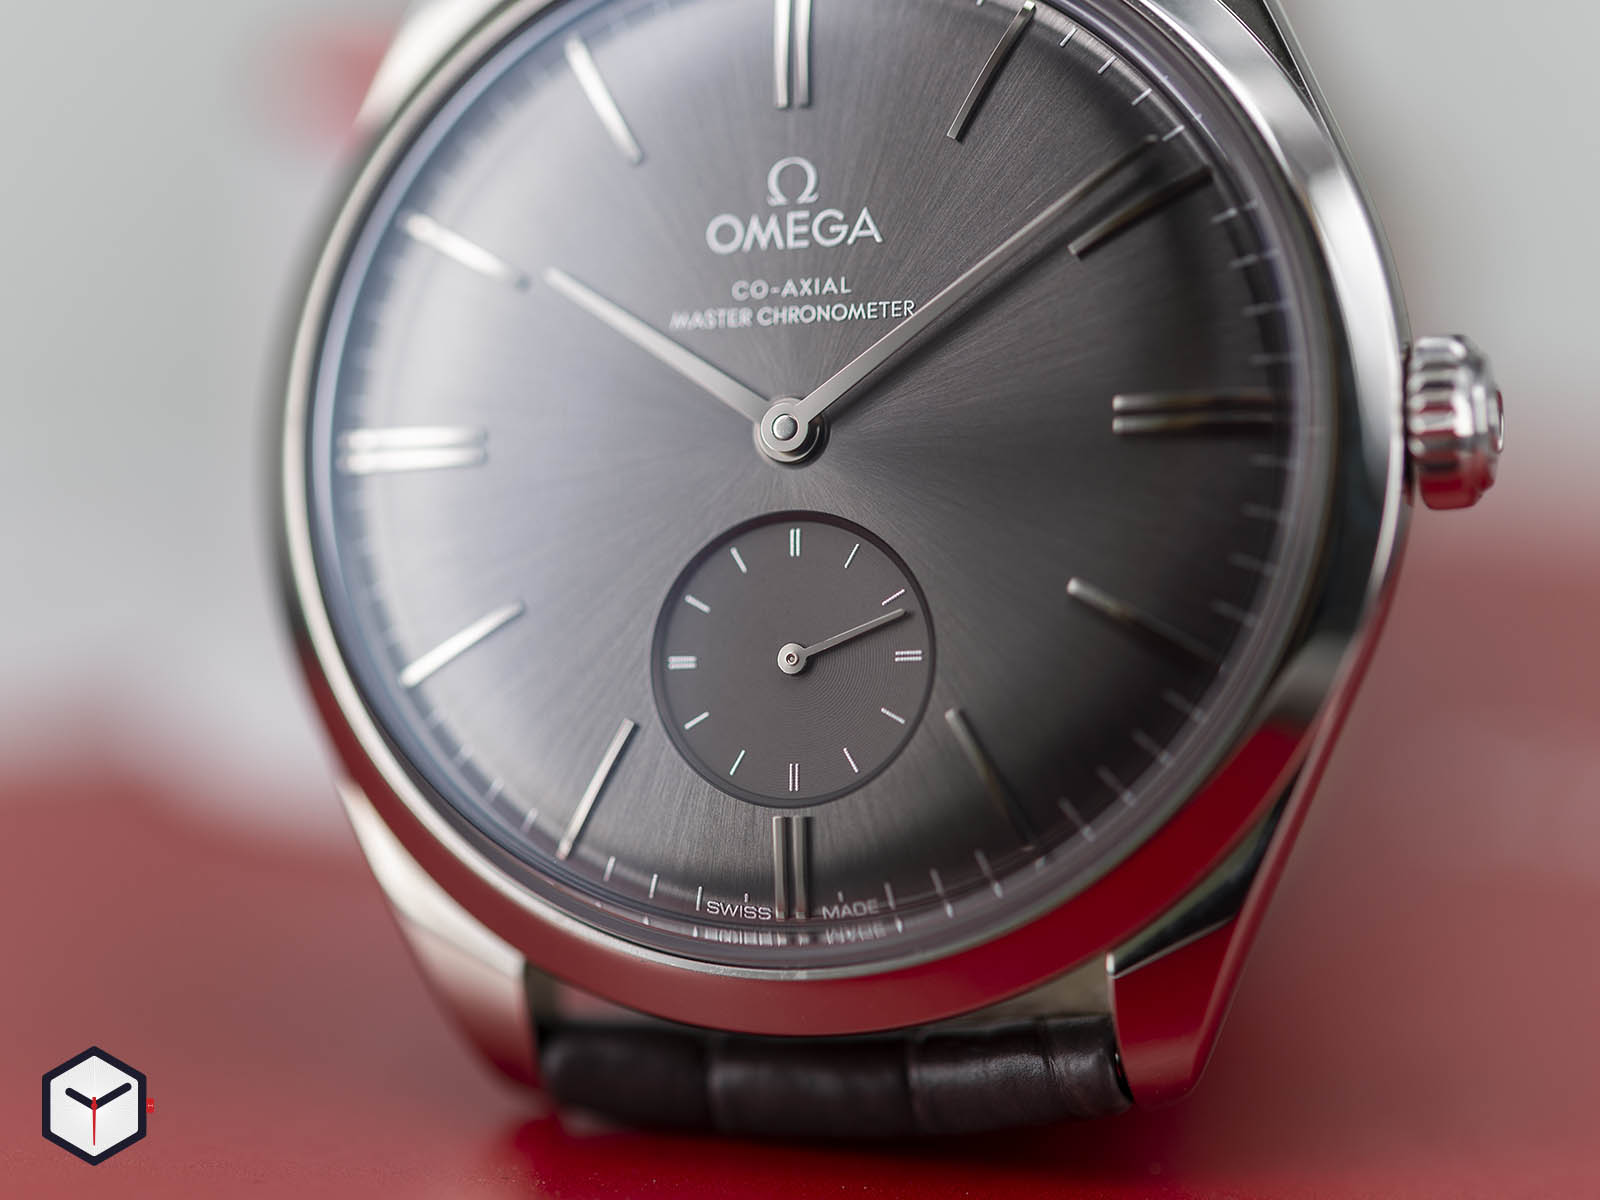 435-13-40-21-06-001-omega-de-ville-tresor-small-seconds-5.jpg